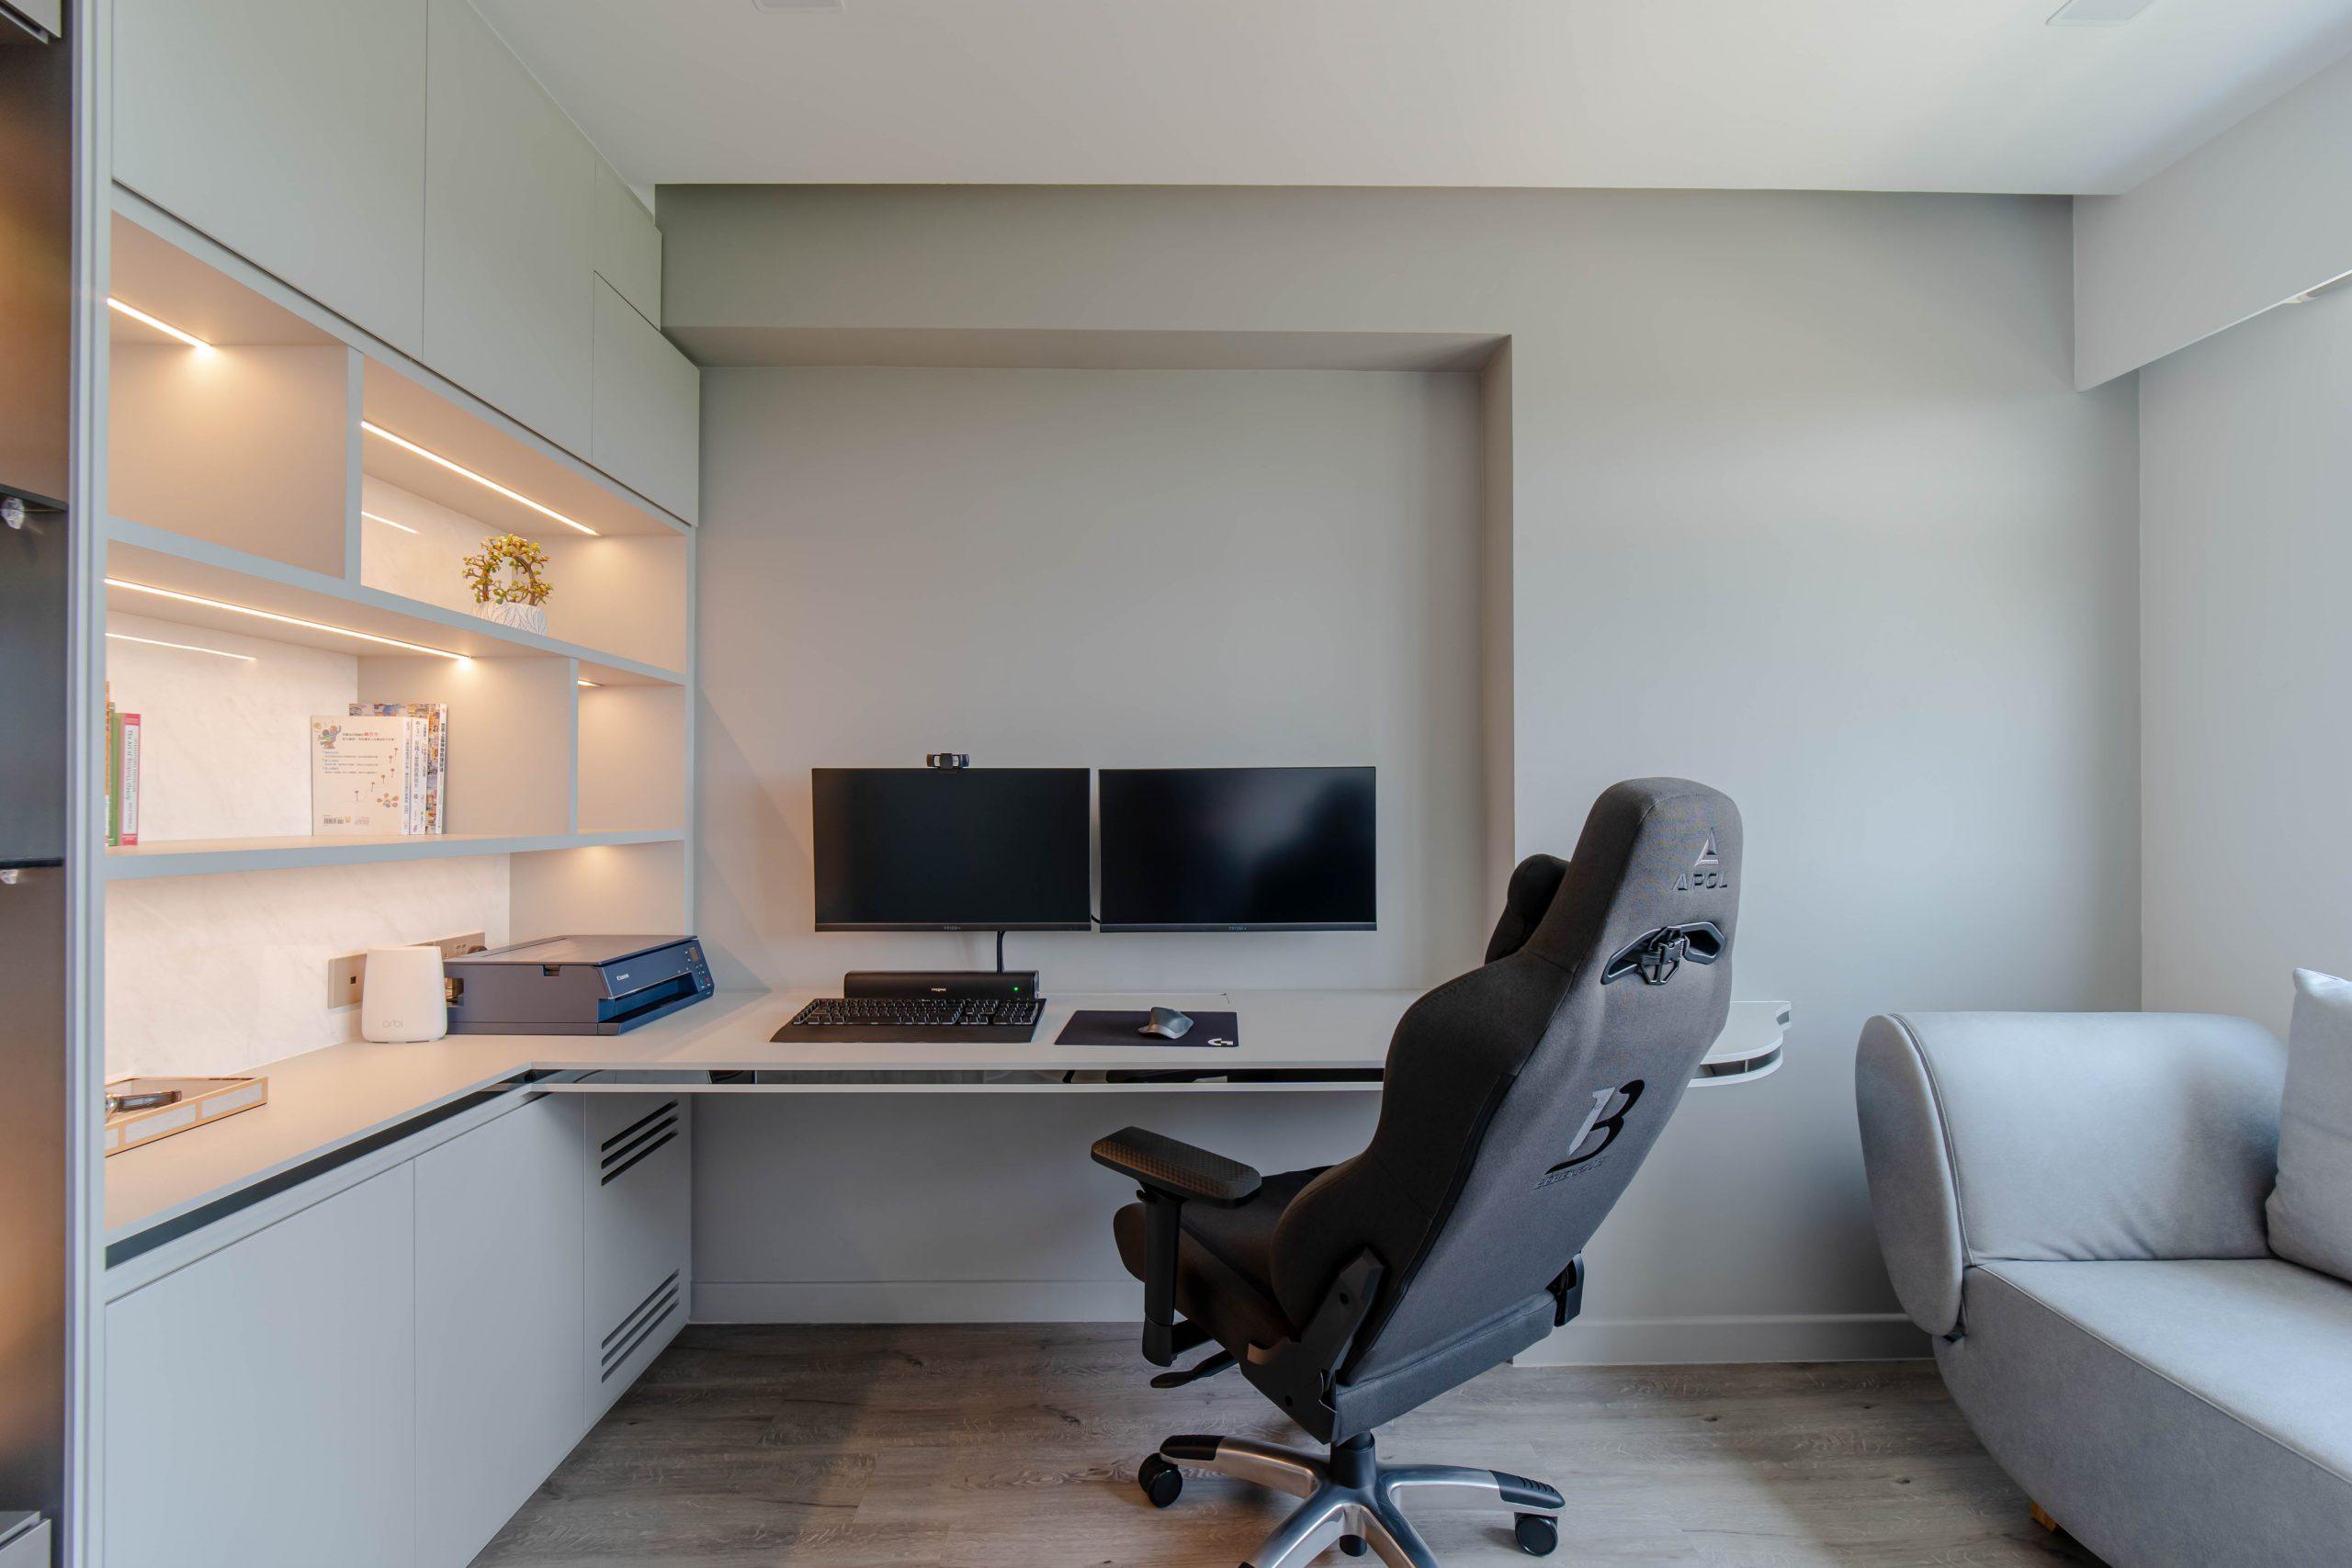 Ultimate Gamer's Room Interior Setup & Decorations